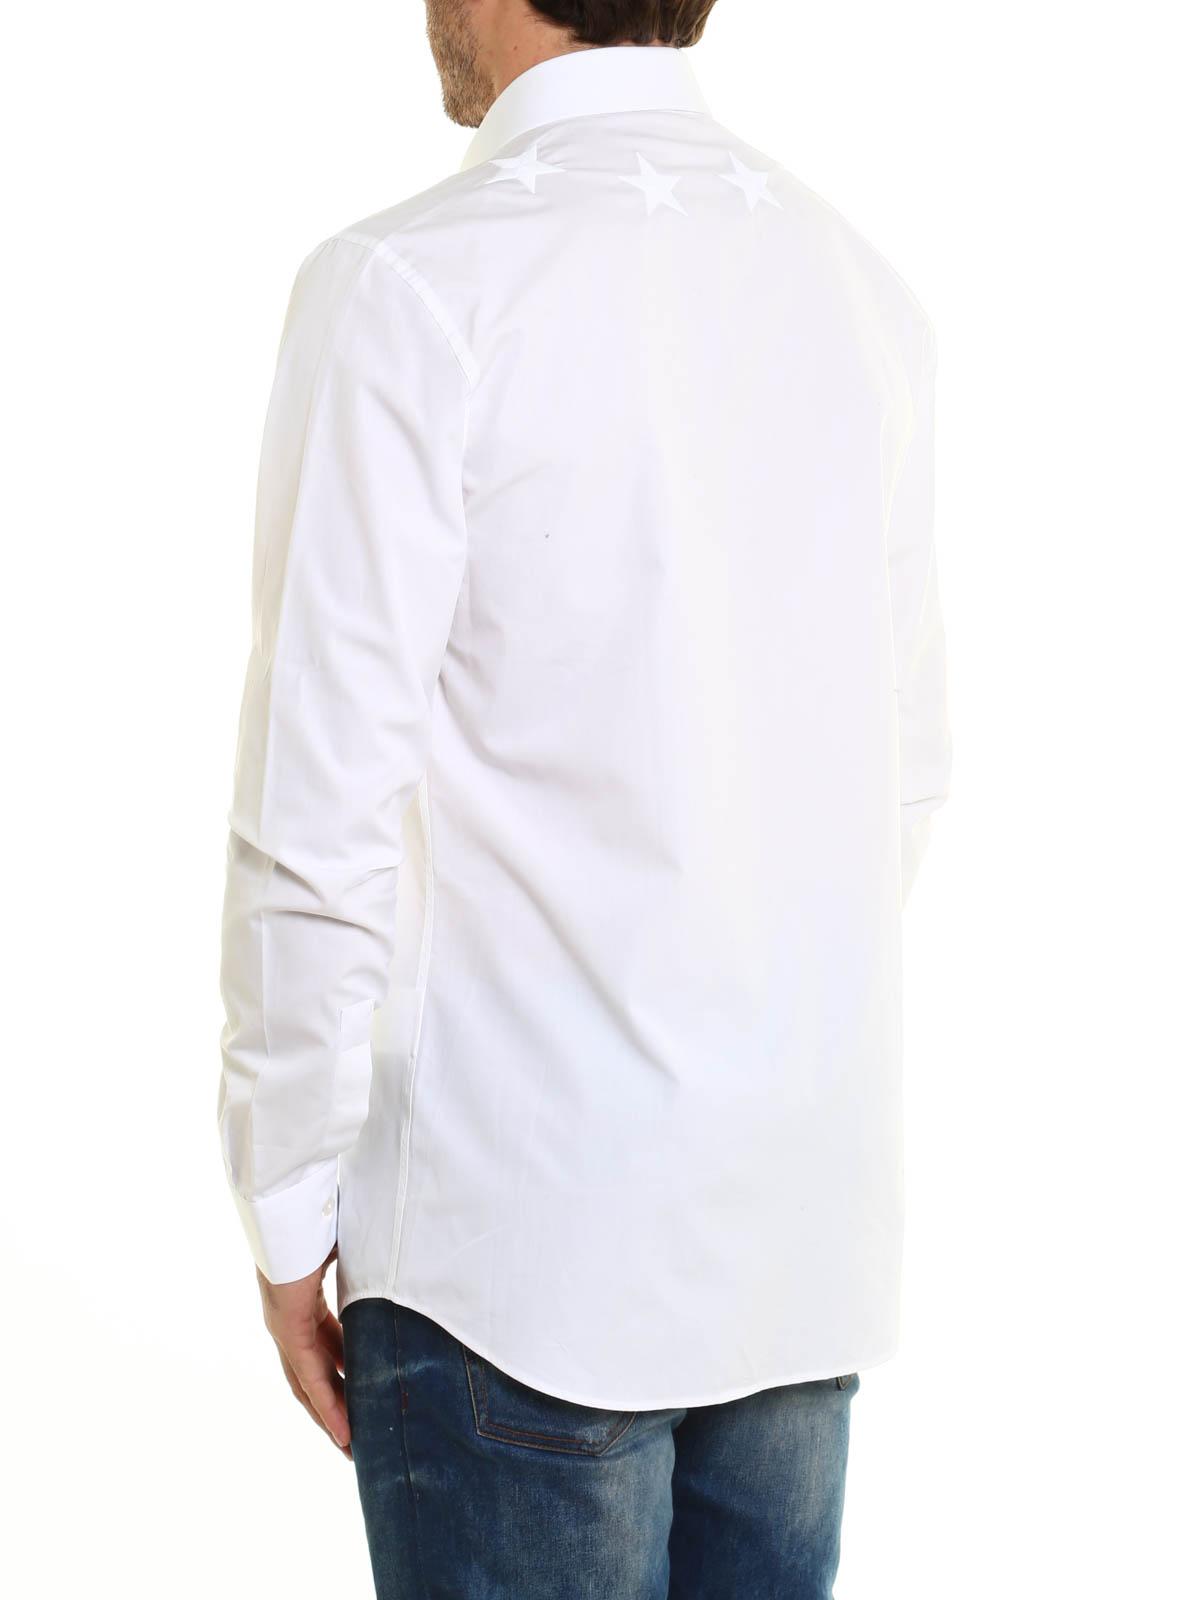 Blanca 17s6061300 Camisas Camisa 100 Para Givenchy Hombre fbgyY67